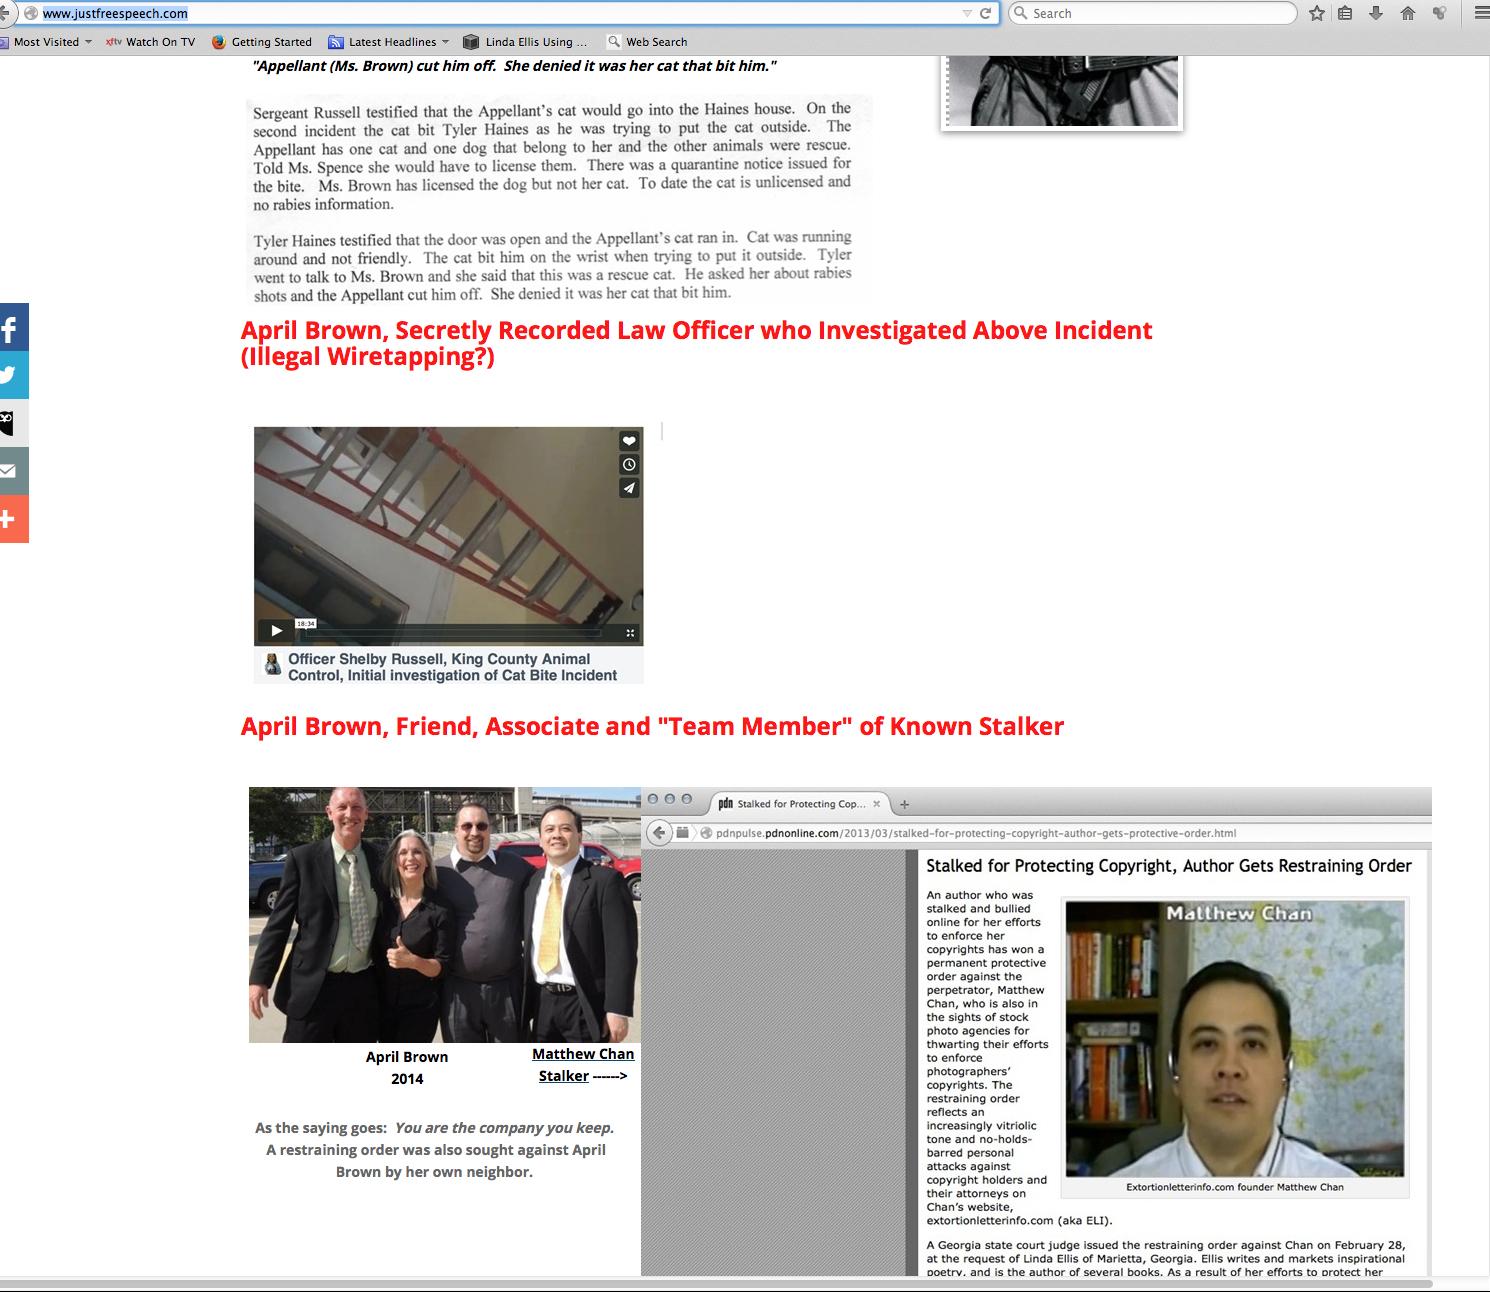 Just Free Speech Screen Shot 2 2015-01-08 at 5.35.47 PM.jpg